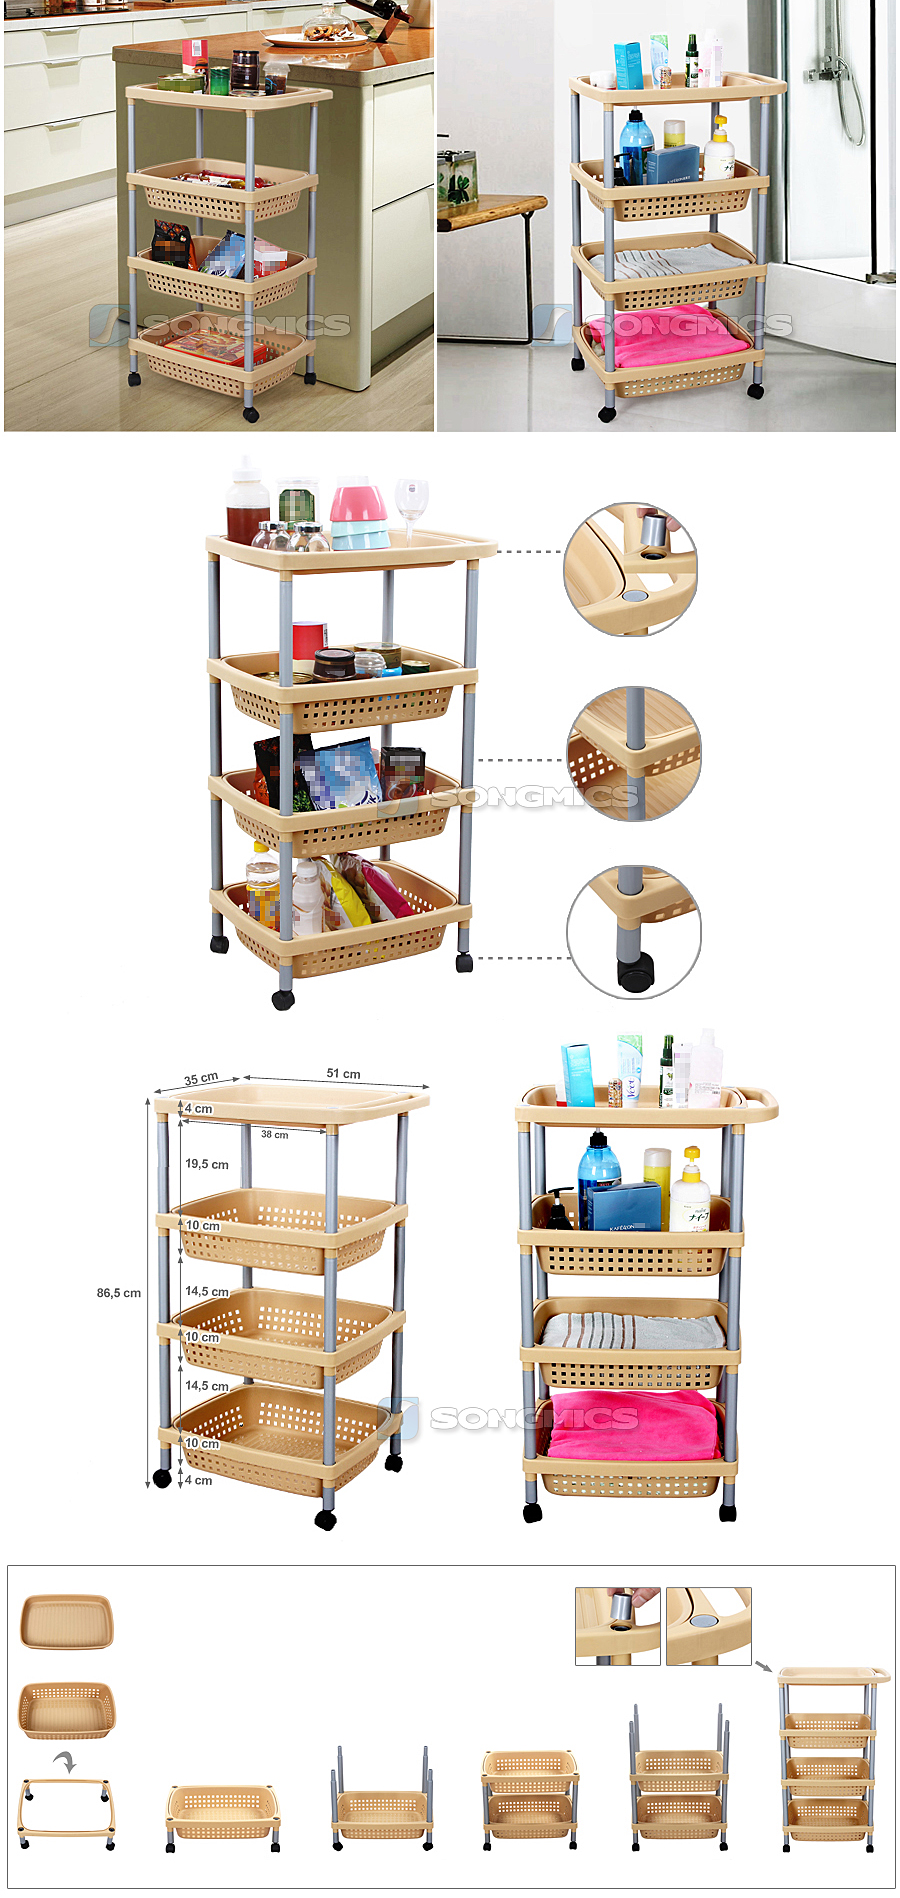 regal englisch deutsch nema ki re nici bookmark this page ili ctrl d abc amarilisonline b. Black Bedroom Furniture Sets. Home Design Ideas